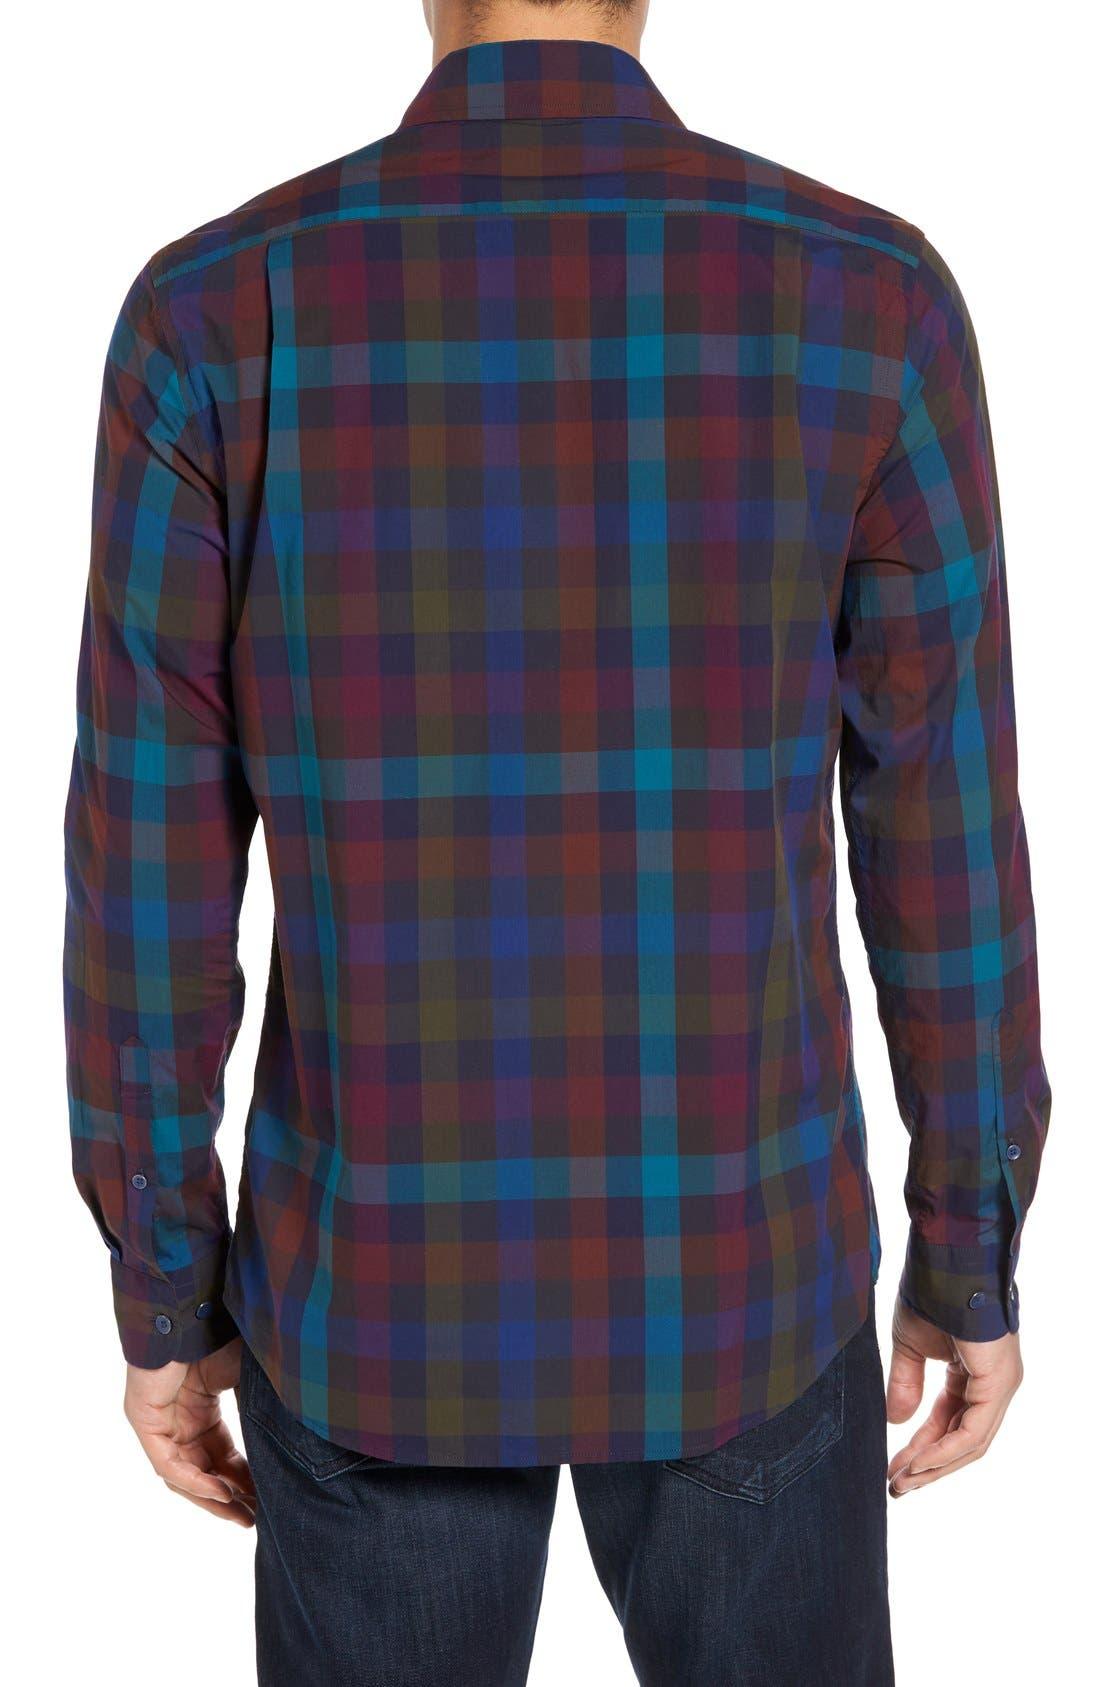 Image of RODD AND GUNN Redbridge Plaid Print Sports Fit Shirt